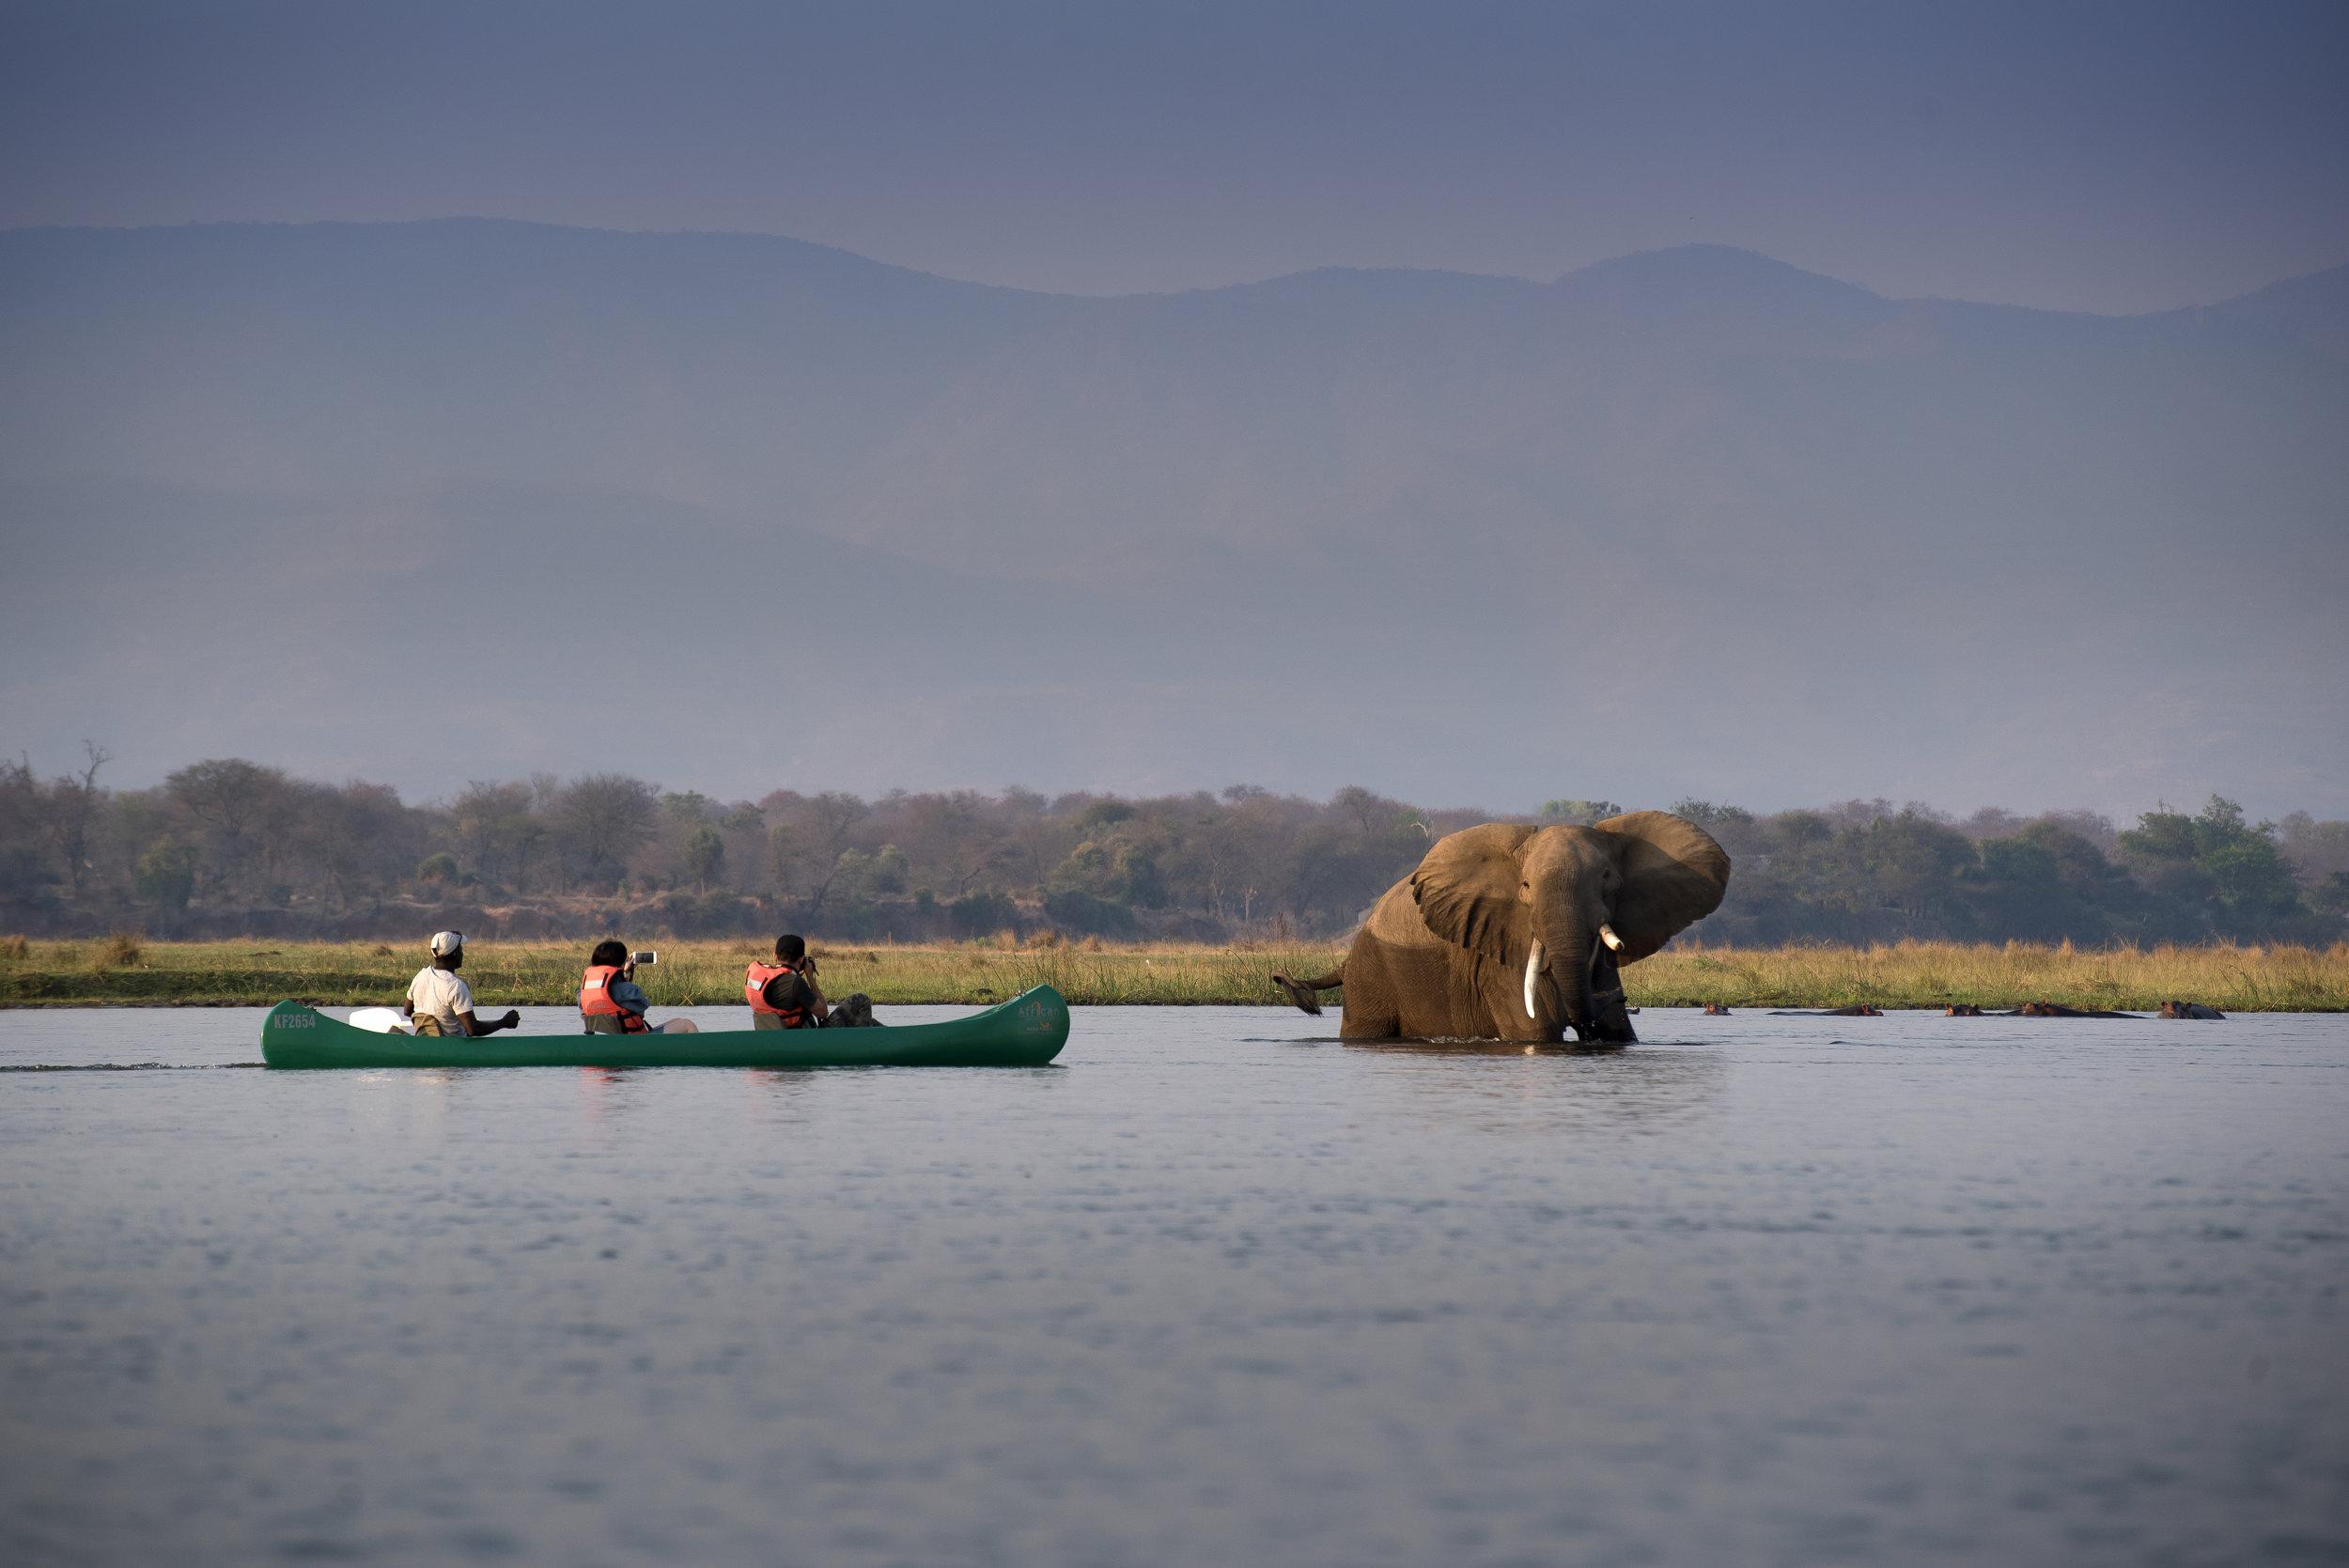 zambezi_expeditions_mana_pools_national_park_zimbabwe_safari_tented_camp_african_bush_camps_canoe_15.jpg